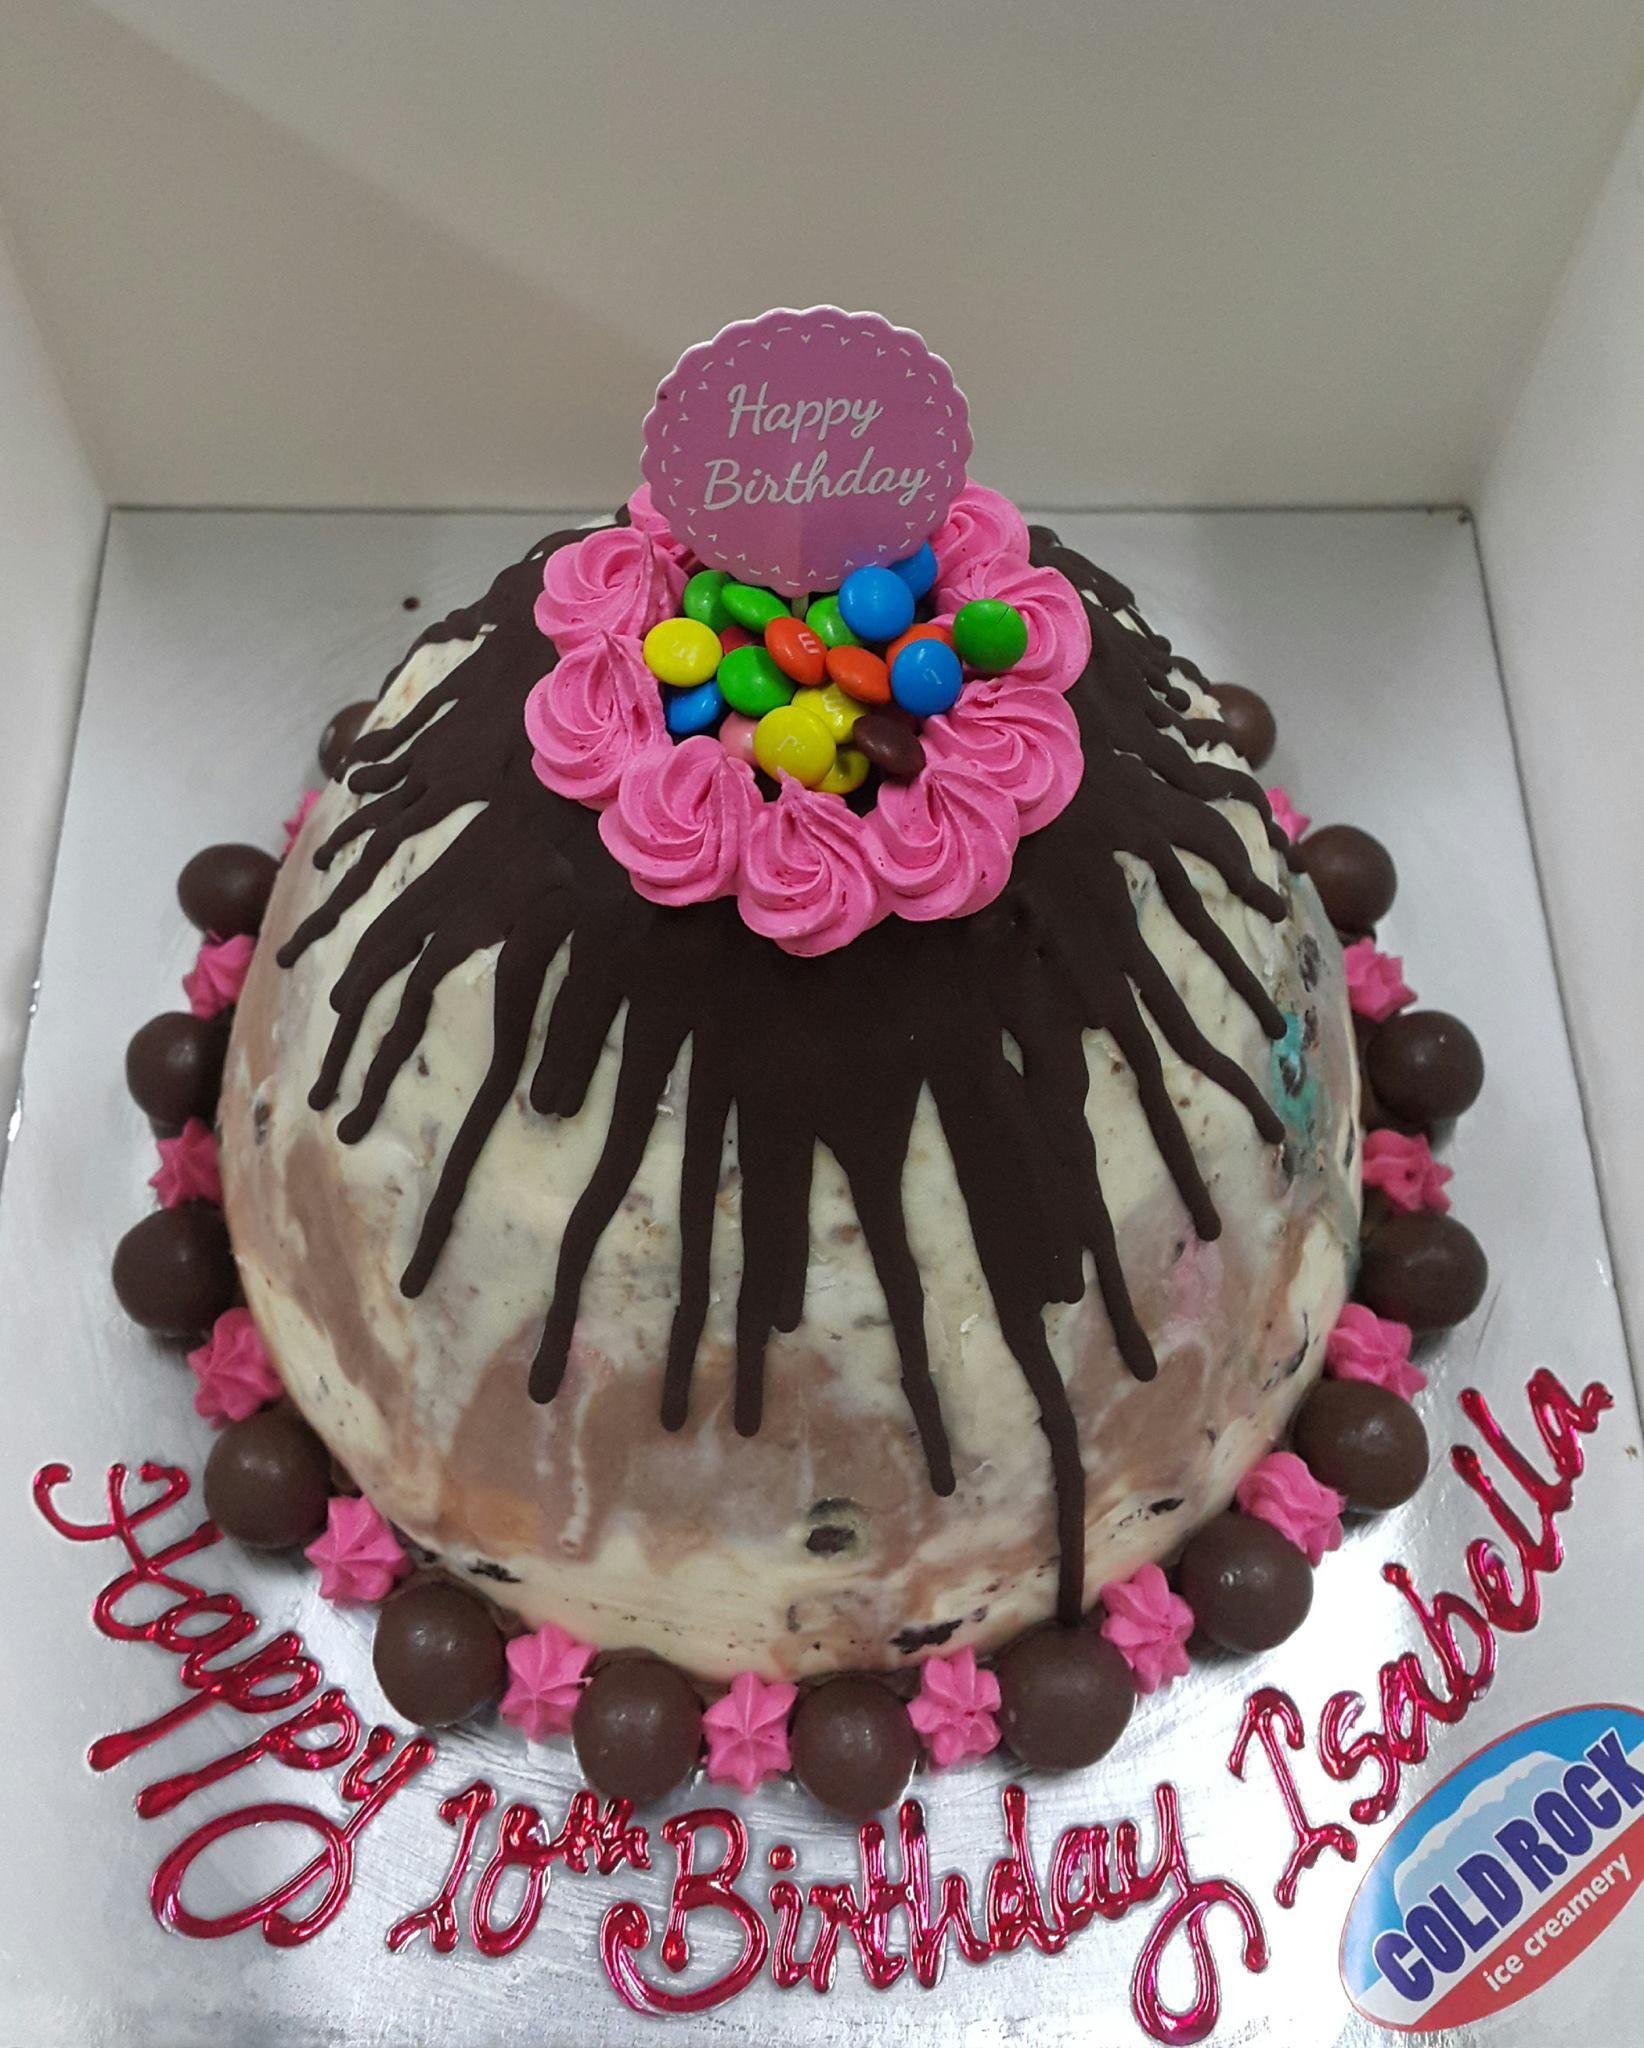 Cold Rock Ice Cream Birthday Cake Three Layer Happy Birthday